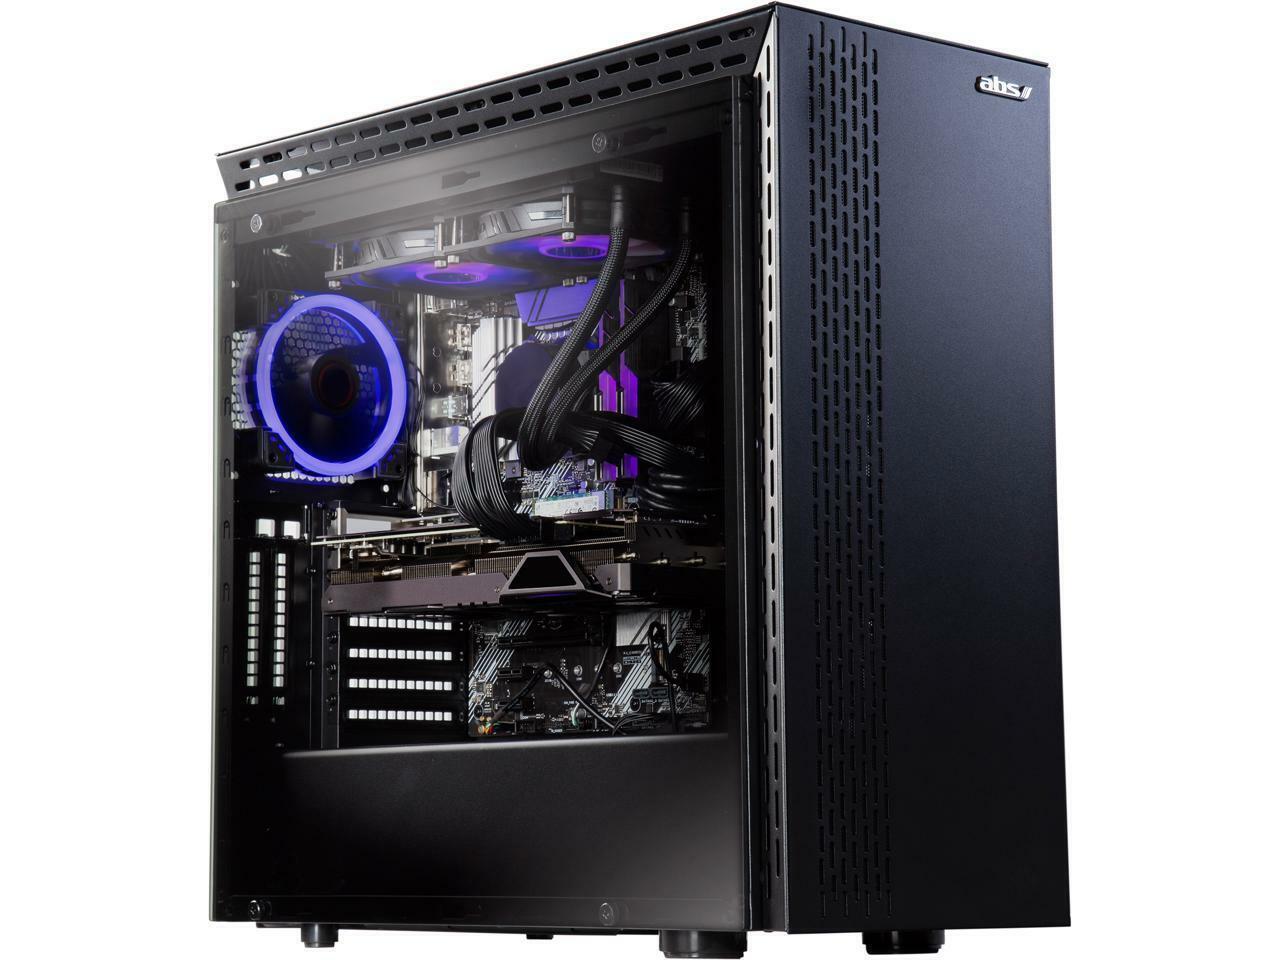 ABS Gladiator Gaming PC - Intel i7 10700K - GeForce RTX 3070 8GB - G.Skill Tride